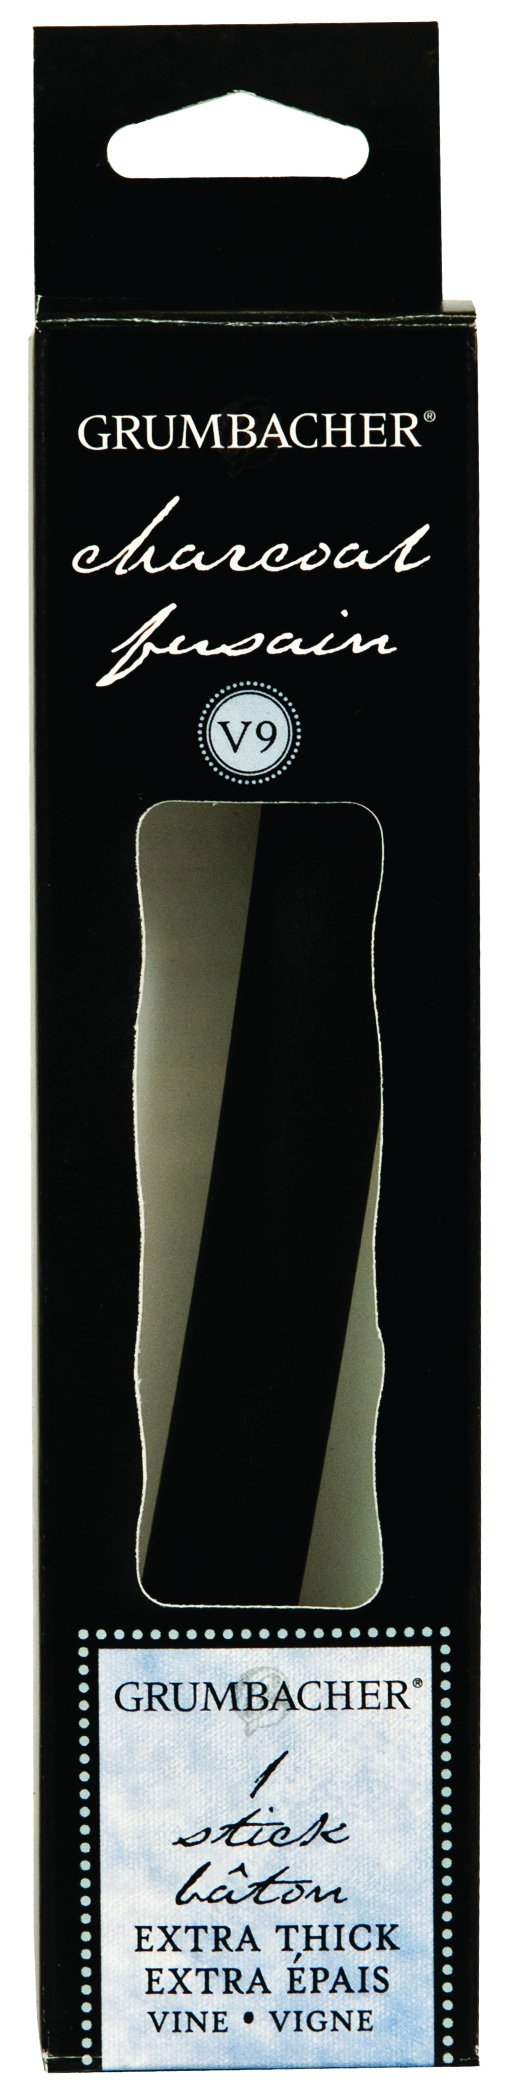 Grumbacher Jumbo Vine Charcoal, Medium, Dark Gray, 1 Pack (V9) by GRUMBACHER